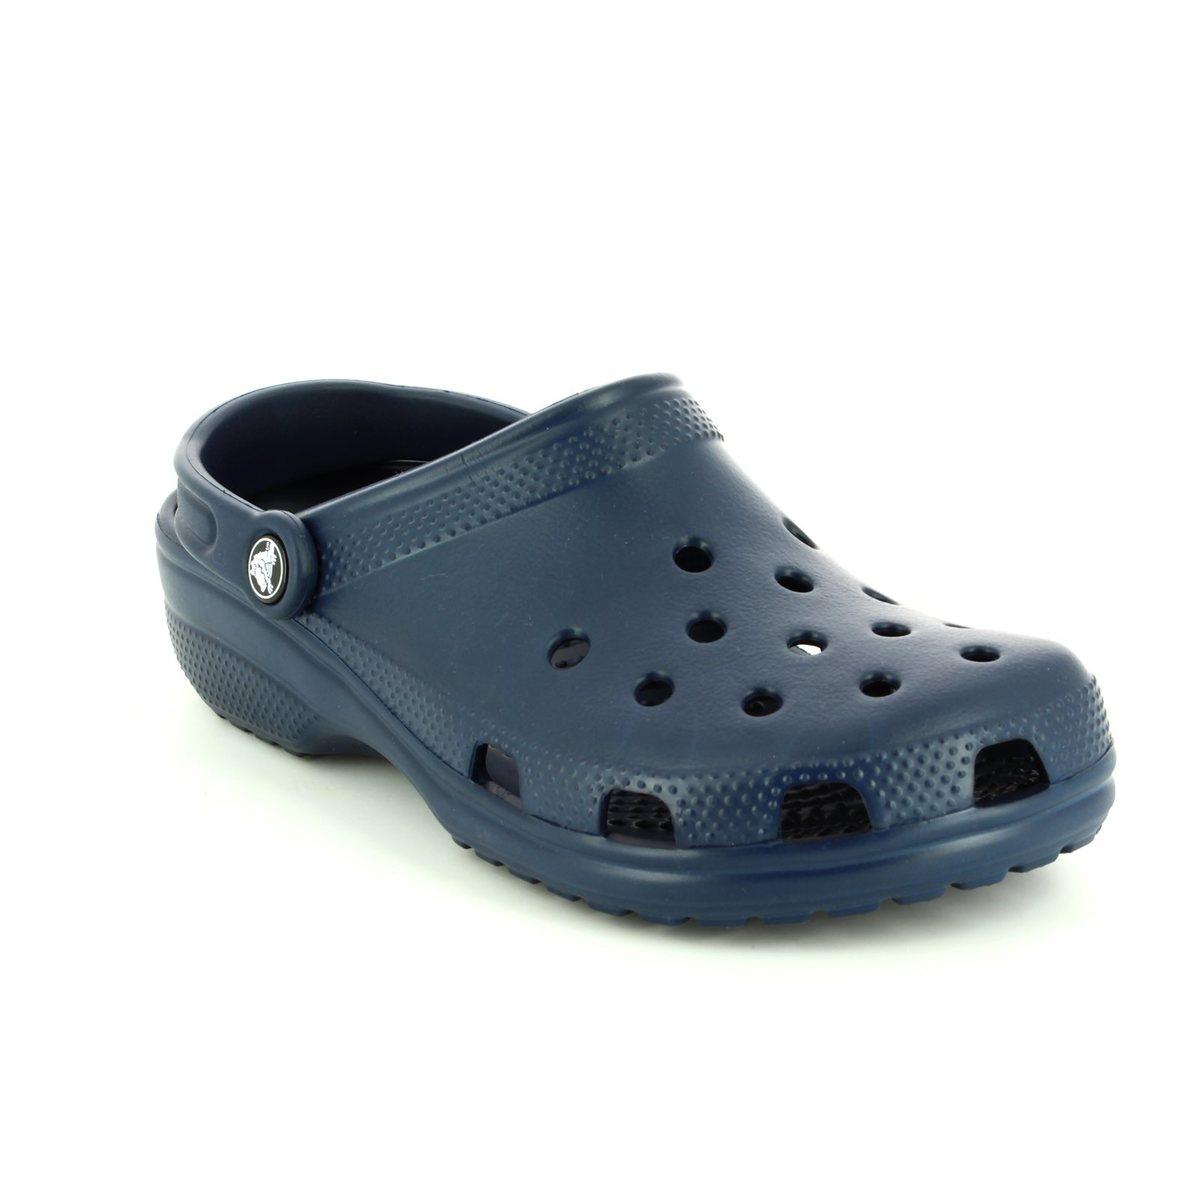 b22312639 Crocs Mens  amp  Womens - Navy - 10001 410 CLASSIC